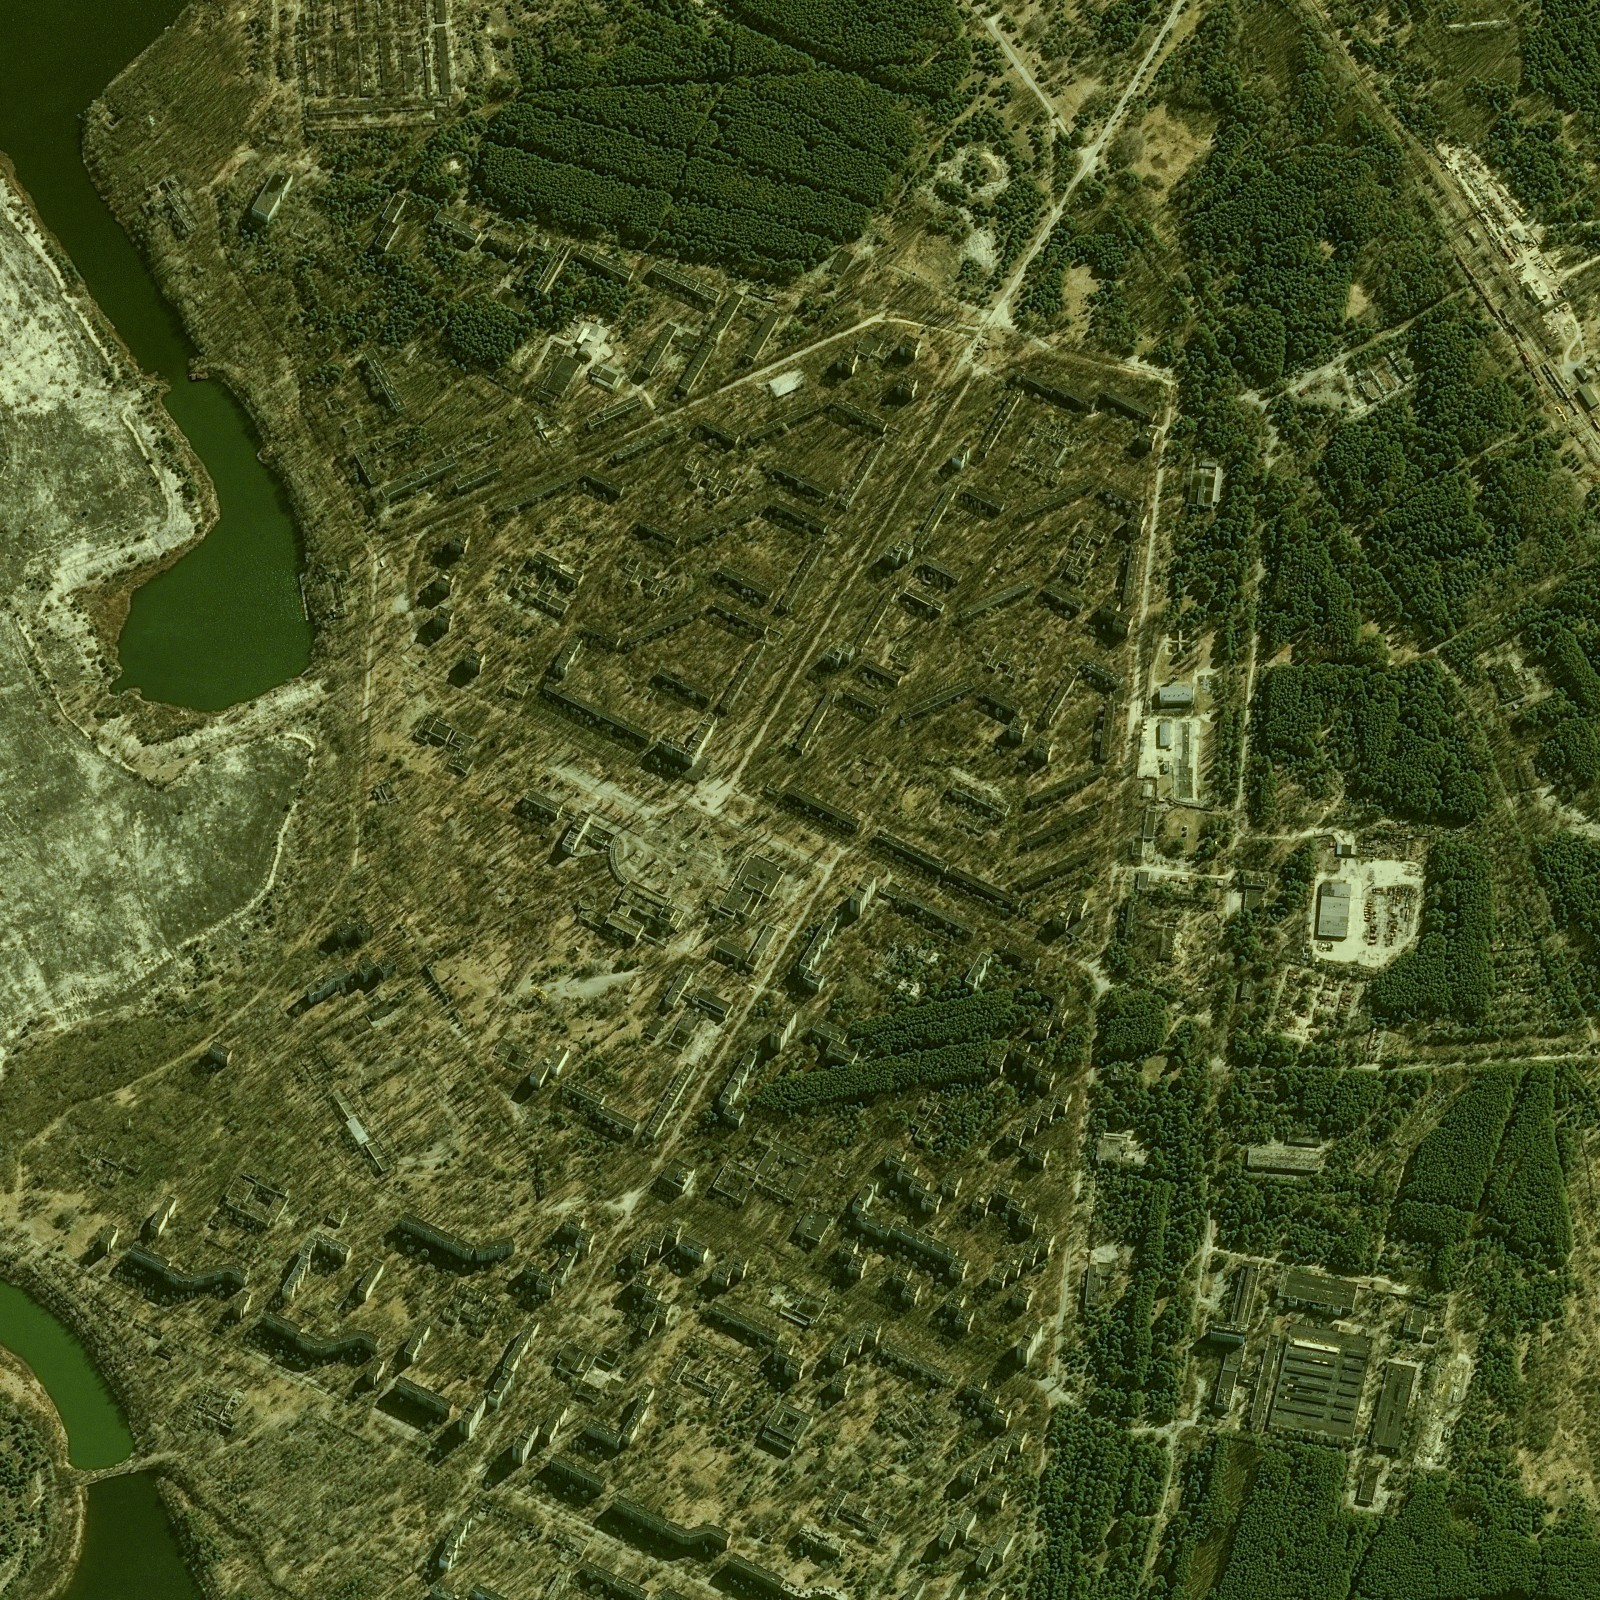 Tchernobyl - Chernobyl - 30 ans - 26 avril 1986 - 26 avril 2016 - satellite Pleiades - Prypriat - Ville fantôme - Manège enfants - Bâtiments abandonnées - Végétation - 27-03-2016 - CNES - Airbus DS - Ukraine